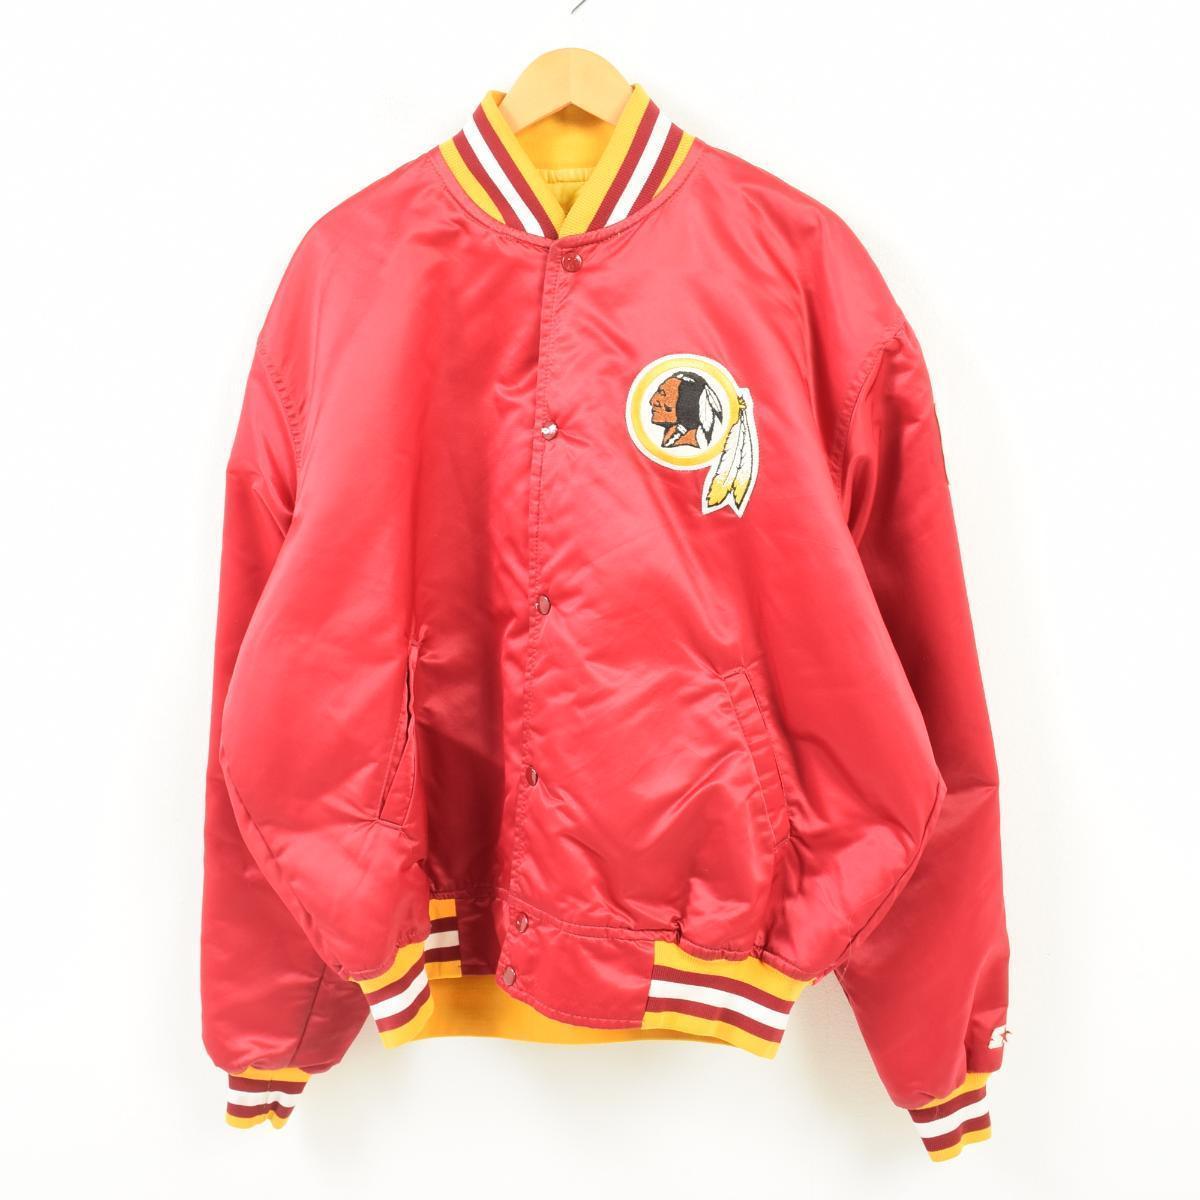 separation shoes 0b3a1 14f99 Men XXL /war1932 in the 90s made in starter Starter NFL WASHINGTON REDSKINS  Washington Redskins nylon award jacket Award jacket USA